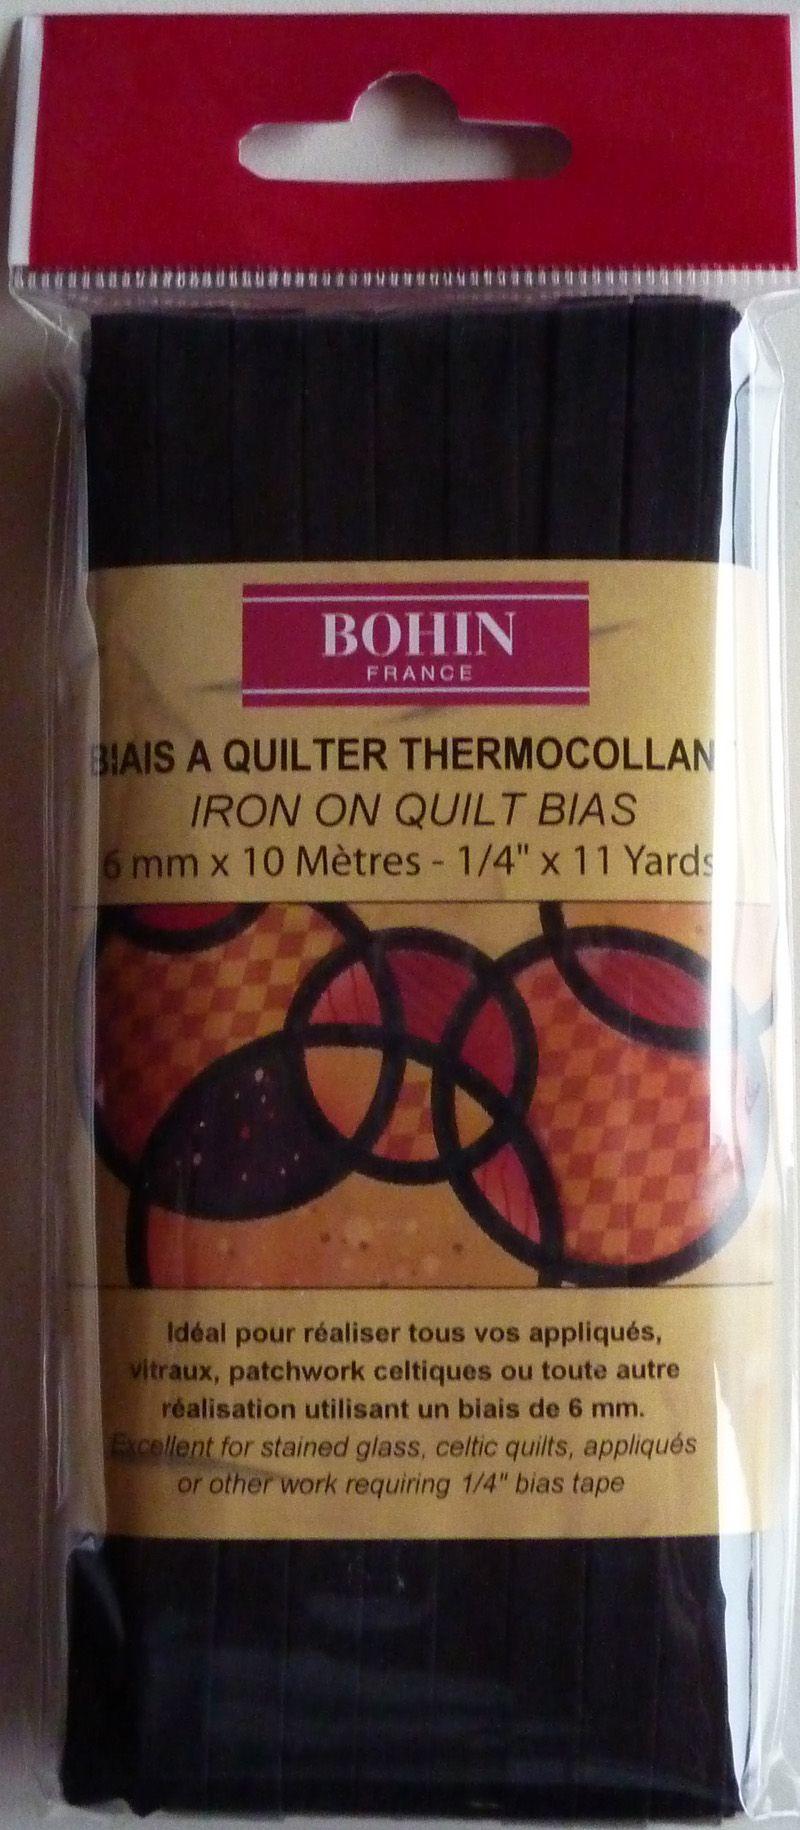 - ✂ Bohin Quick Bias Quiltband für Celtic-Quilts - ✂ Bohin Quick Bias Quiltband für Celtic-Quilts